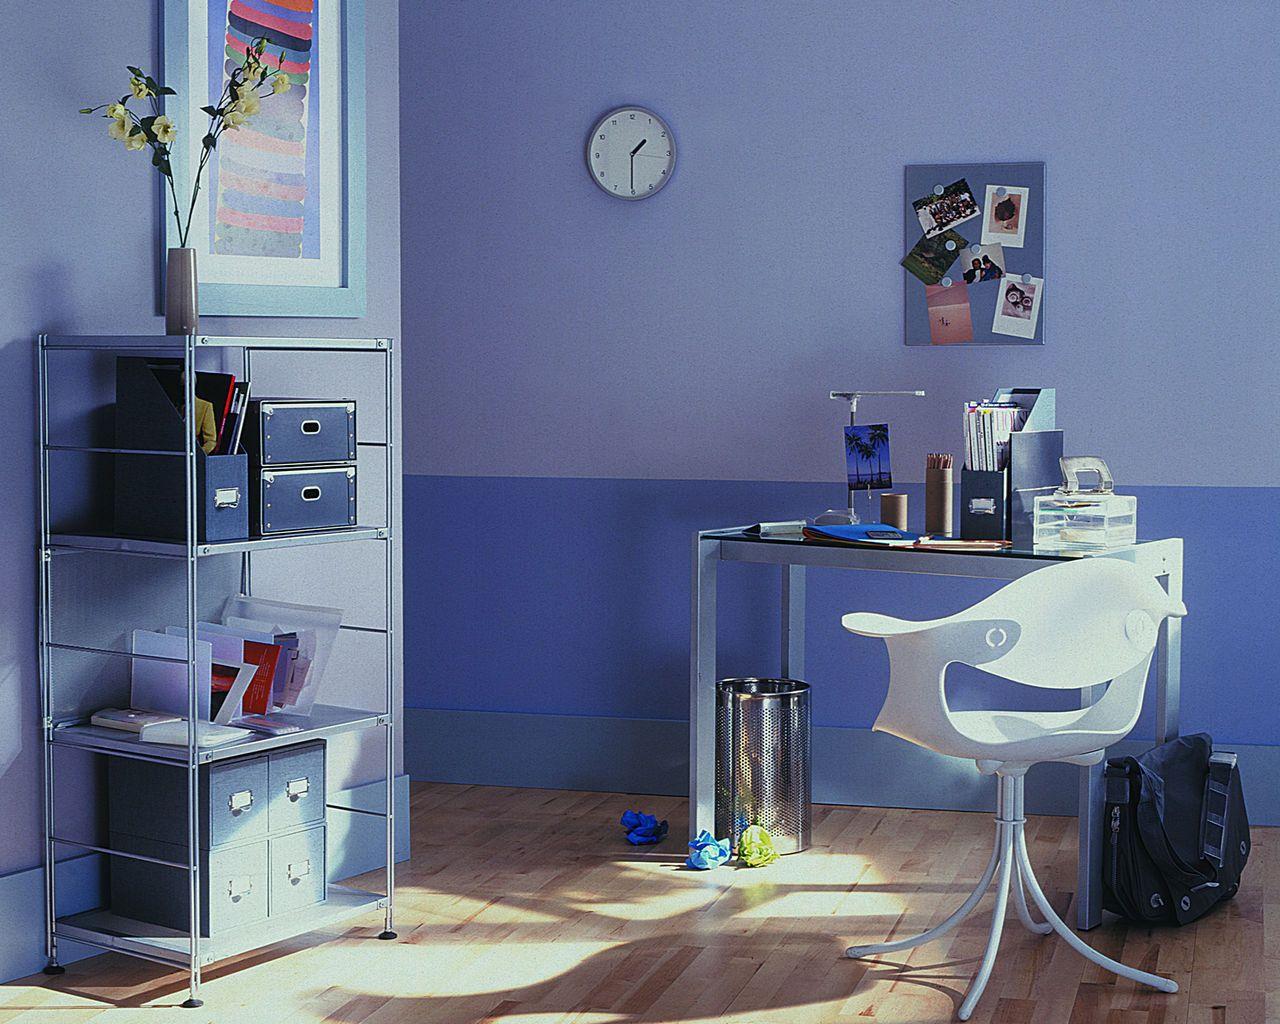 peinture bureau d co gris violet dulux valentine bureau office bureau decoration. Black Bedroom Furniture Sets. Home Design Ideas